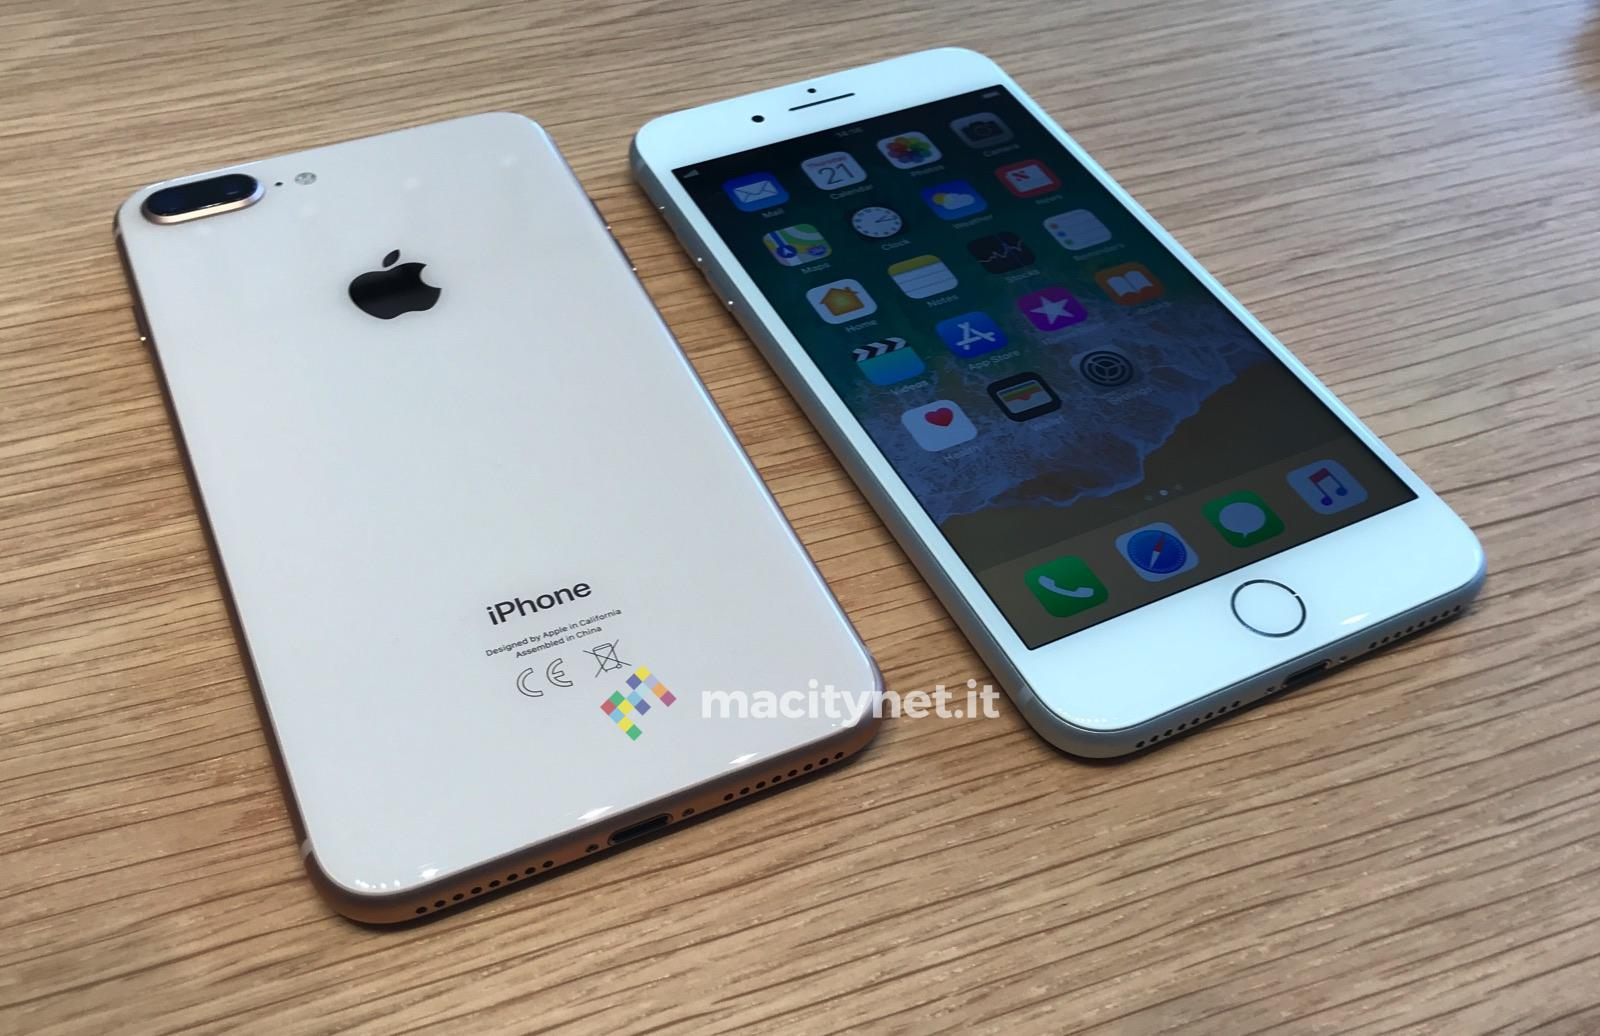 235436580a9 Ciao Galaxy, nel test video 4K iPhone 8 stravince contro Galaxy Note 8 e S8+